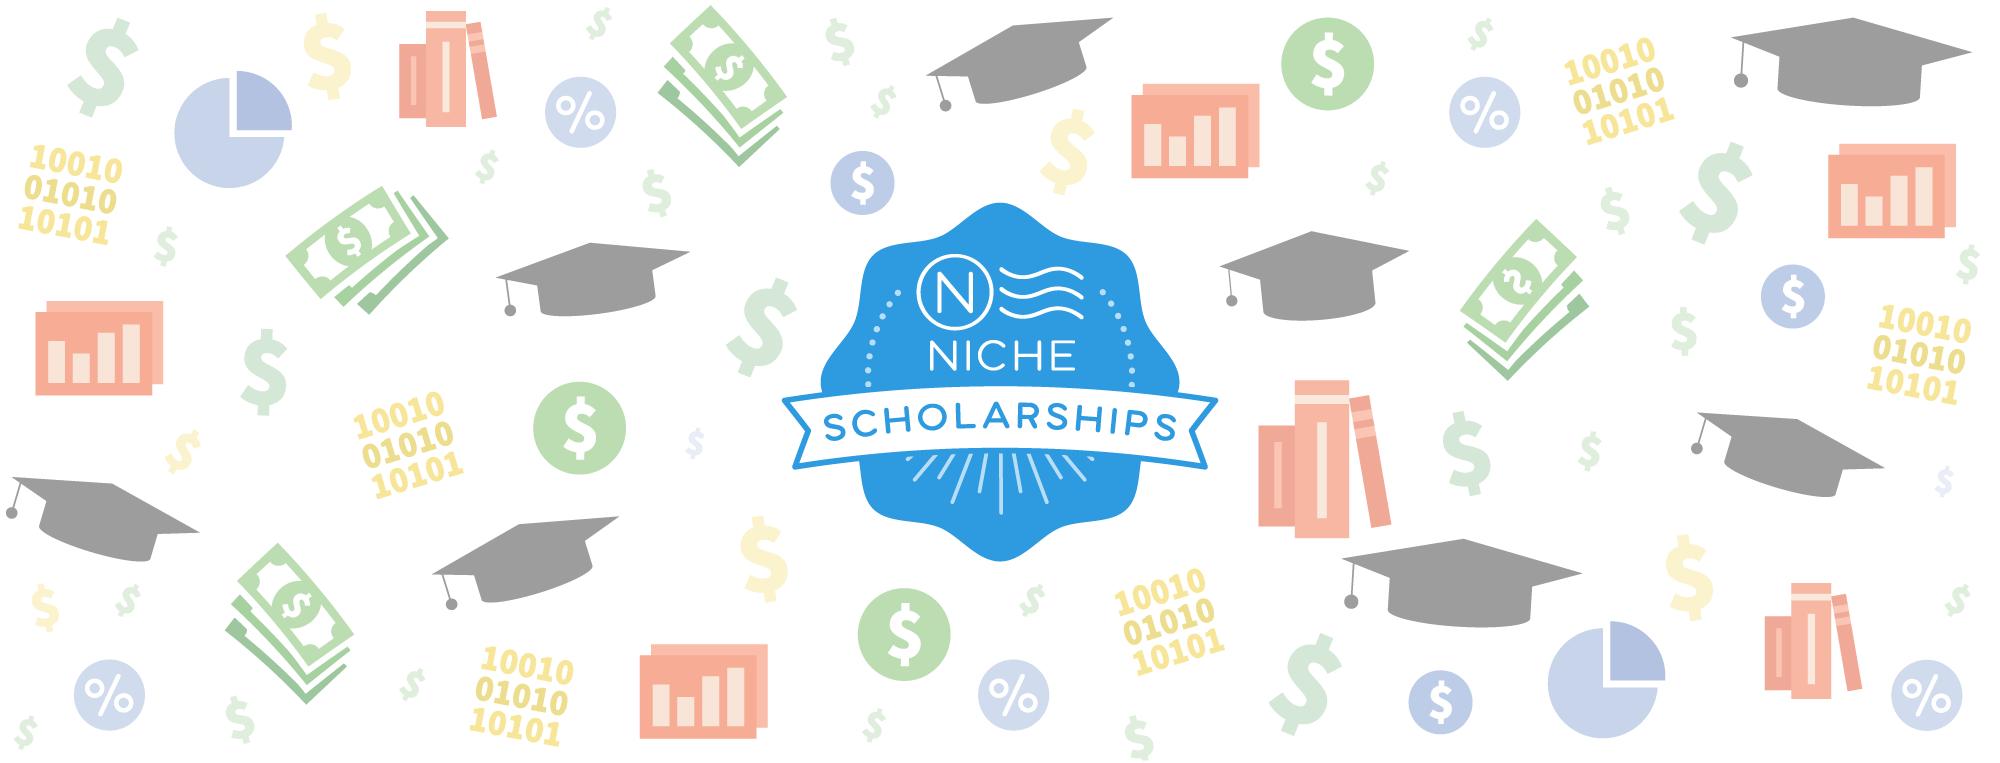 003 Niche No Essay Scholarship Example Marvelous Reddit Winners Full